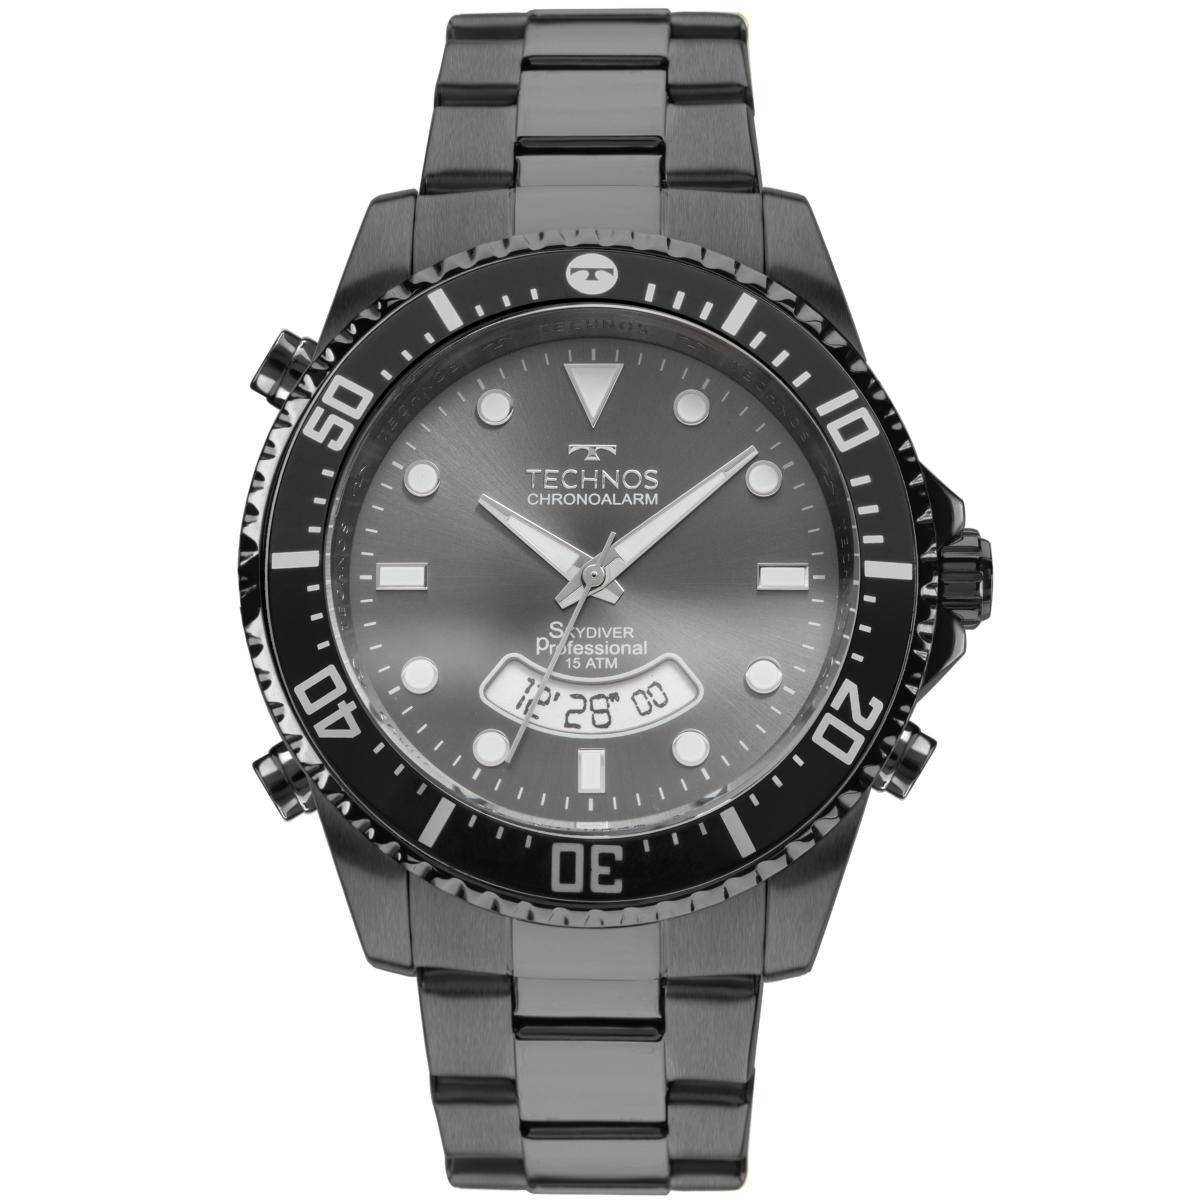 0db4ea2bfe8 Relógio Masculino Technos Analogico Digital T205JE 4P 47mm Pulseira Aço Fume